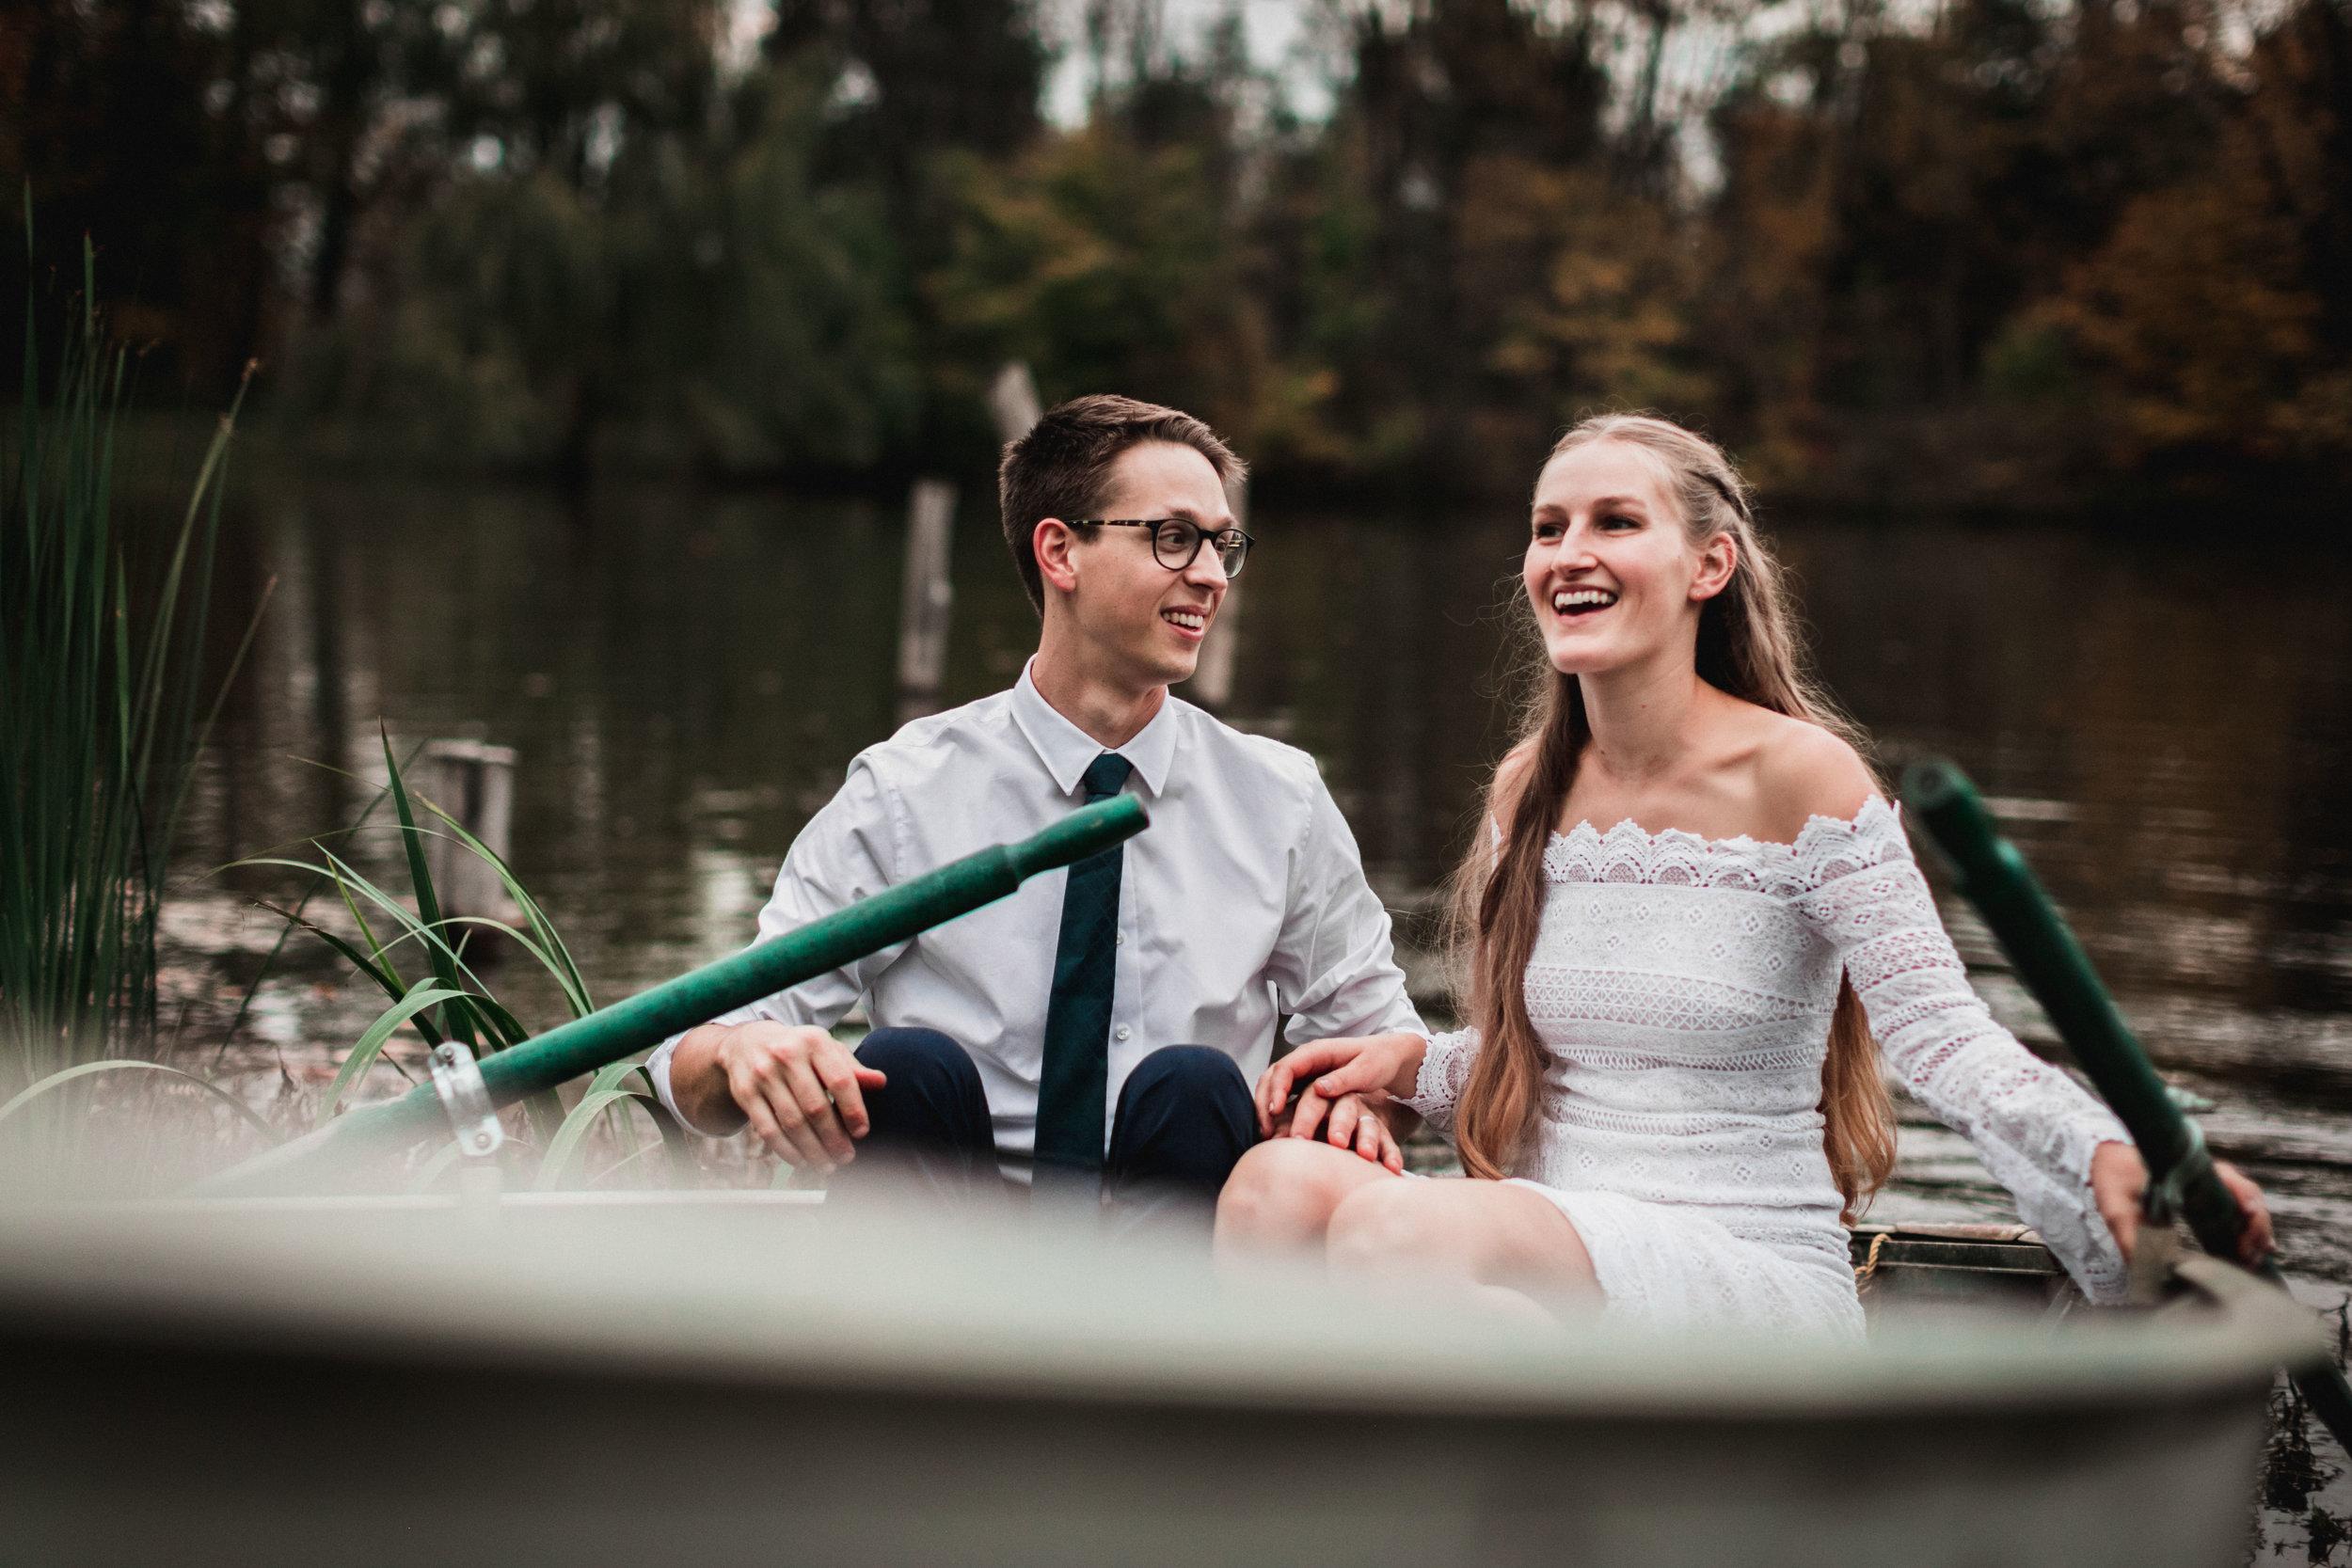 vild-photography-photographer-tahoe-intimate-wedding-adventure-van-abigail-317.jpg